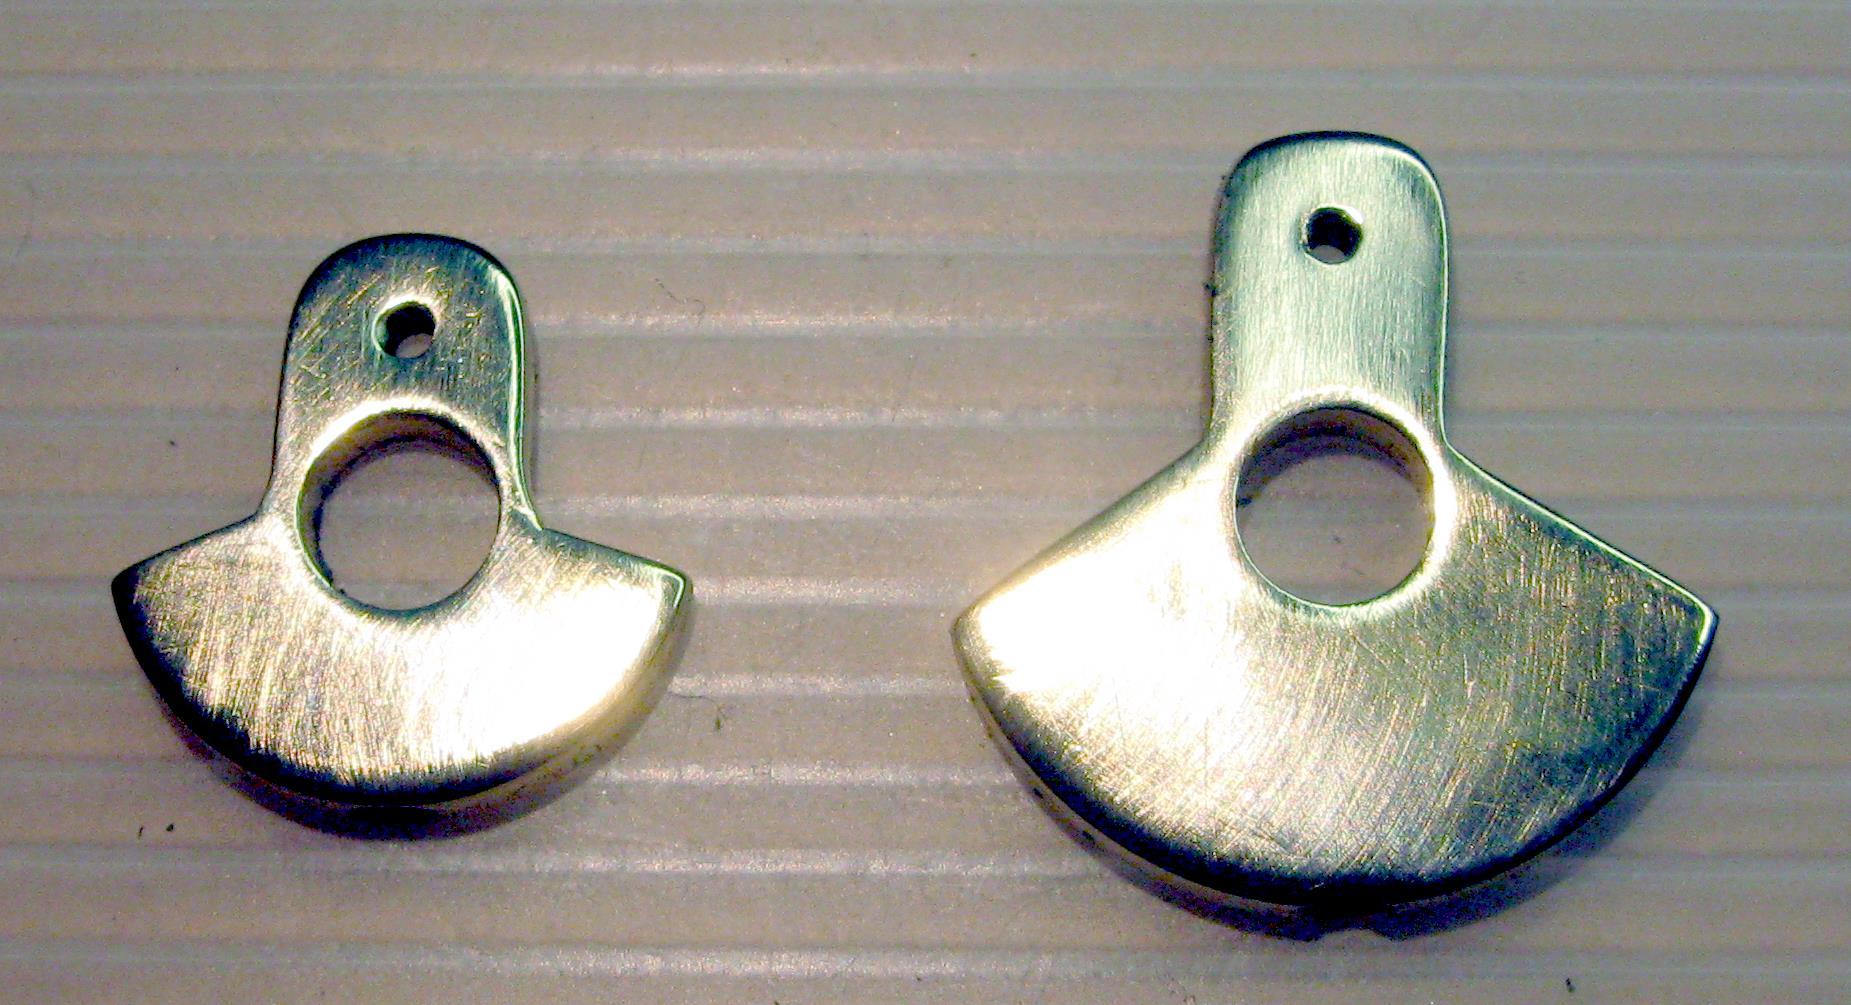 autosol metal polish instructions